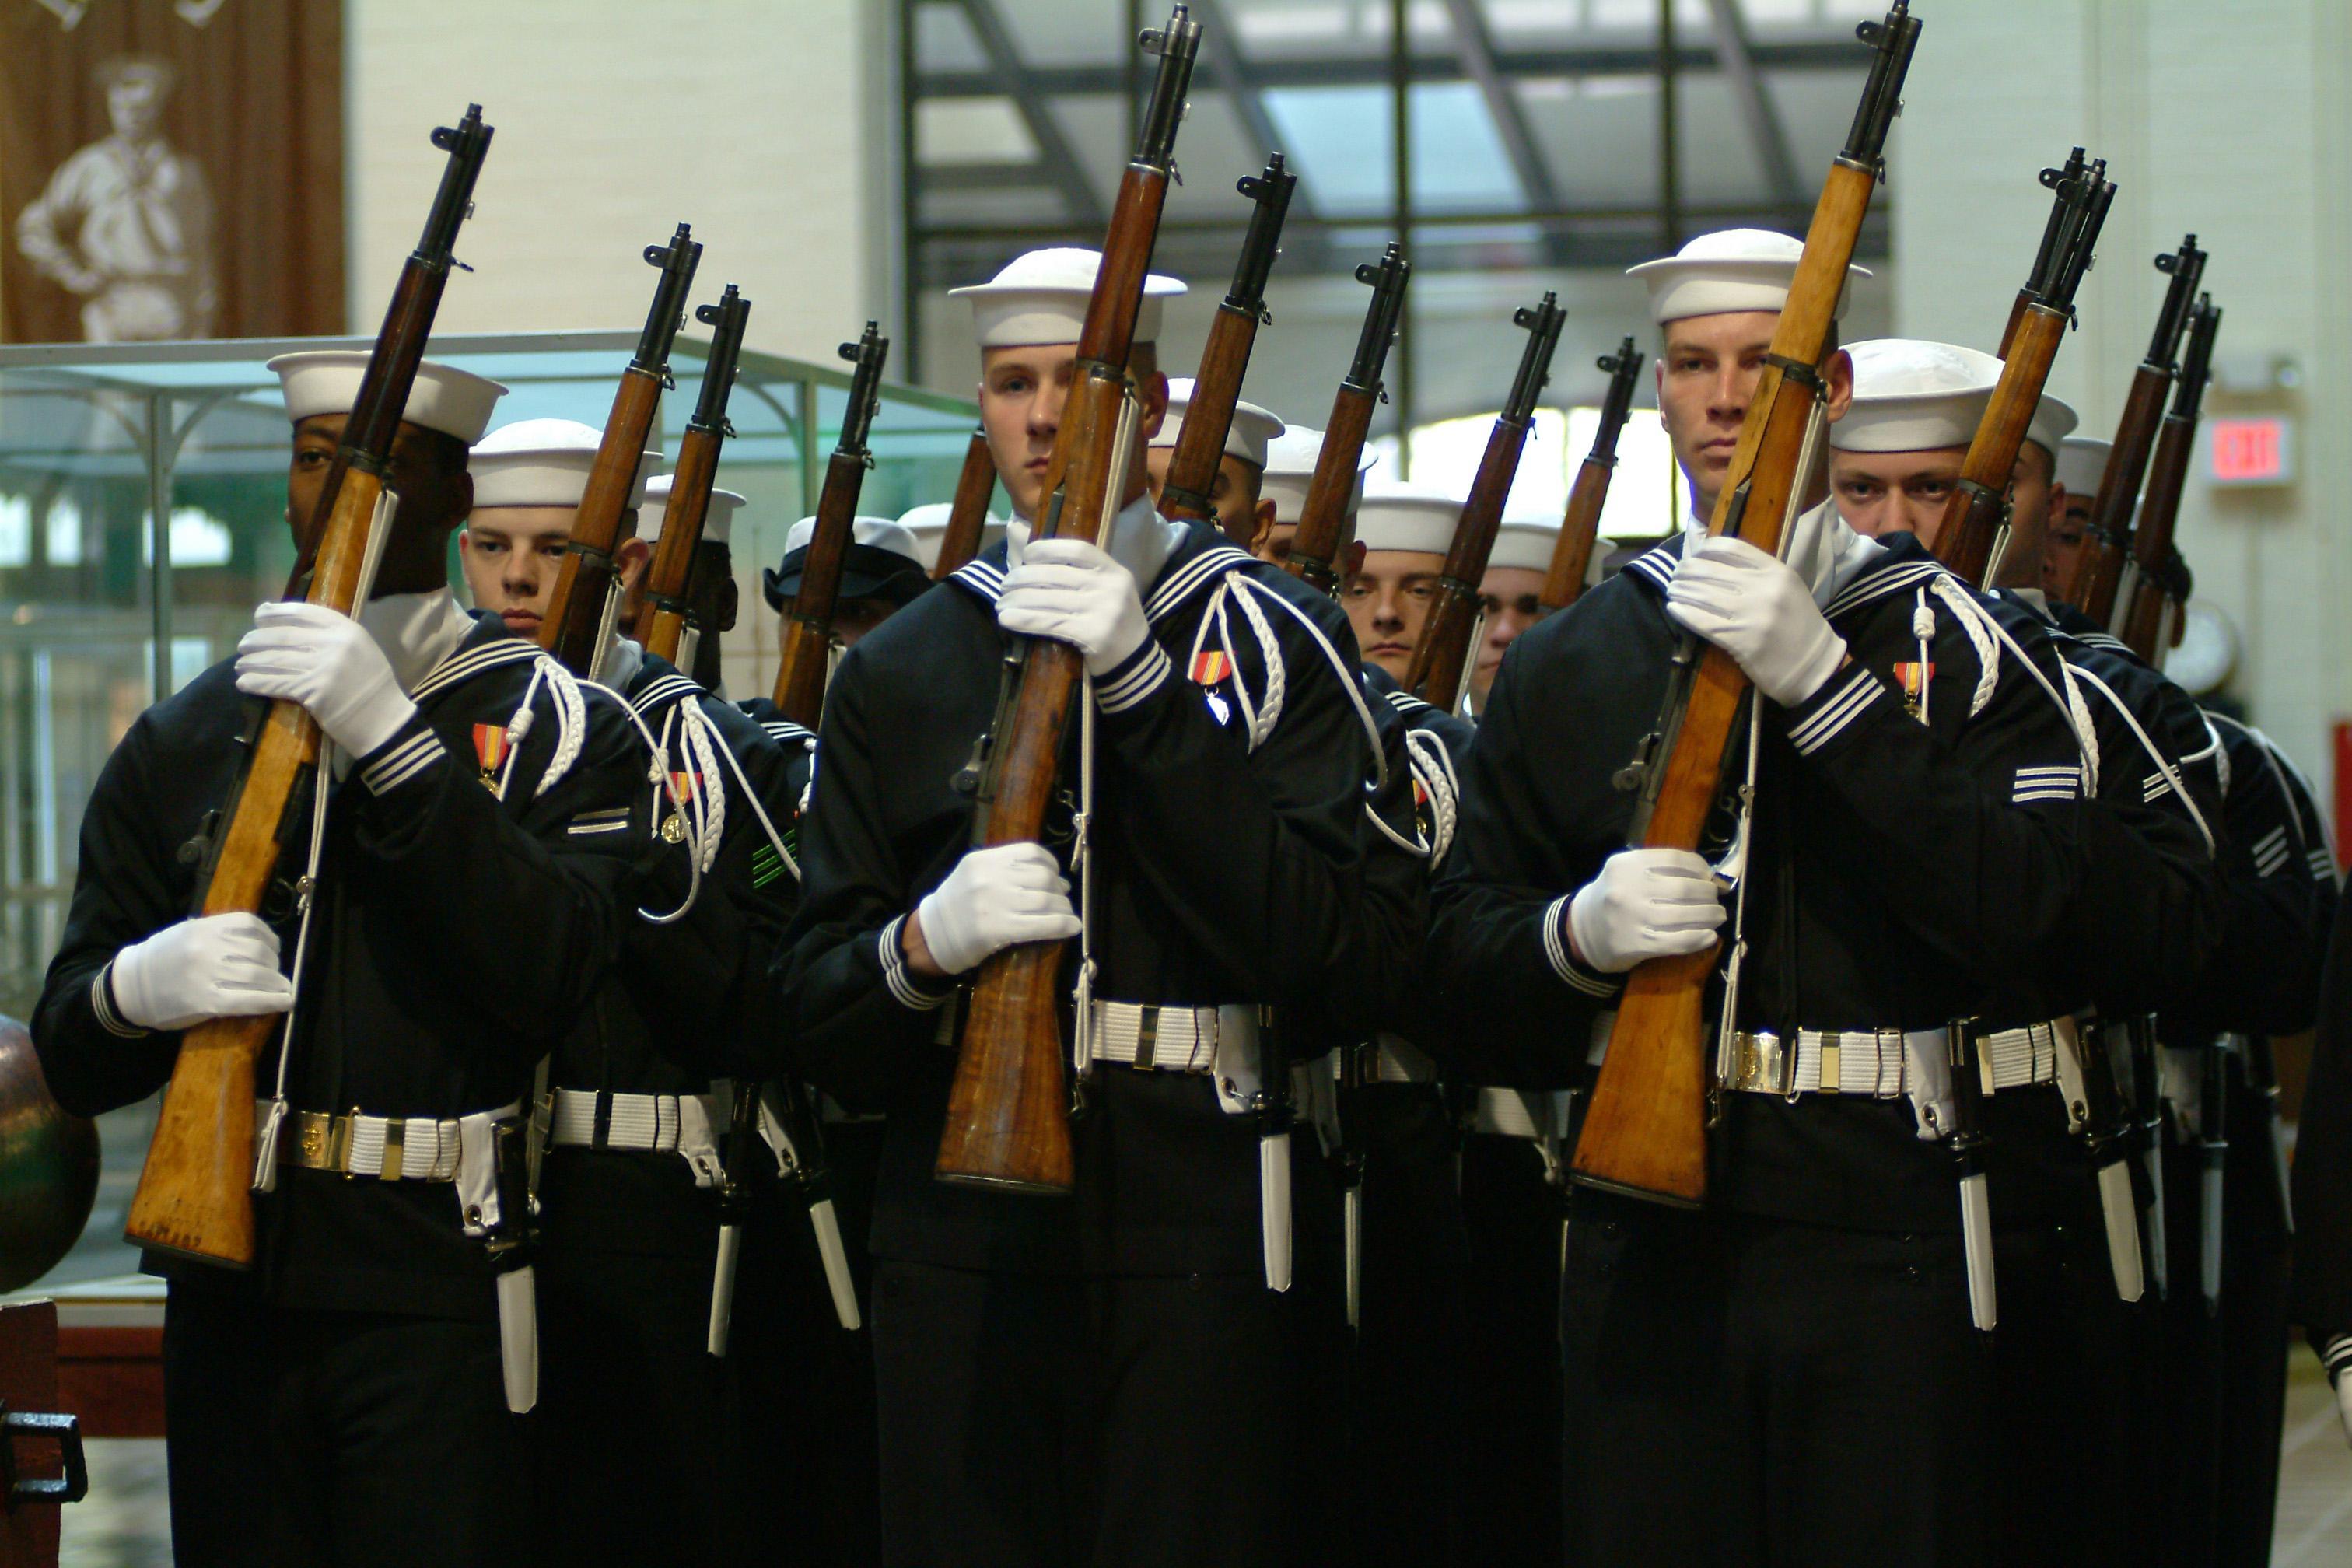 Fileus Navy 031210 N 2383b 006 Us Navy Ceremonial Guard Sailors - Us-navy-ceremonial-guard